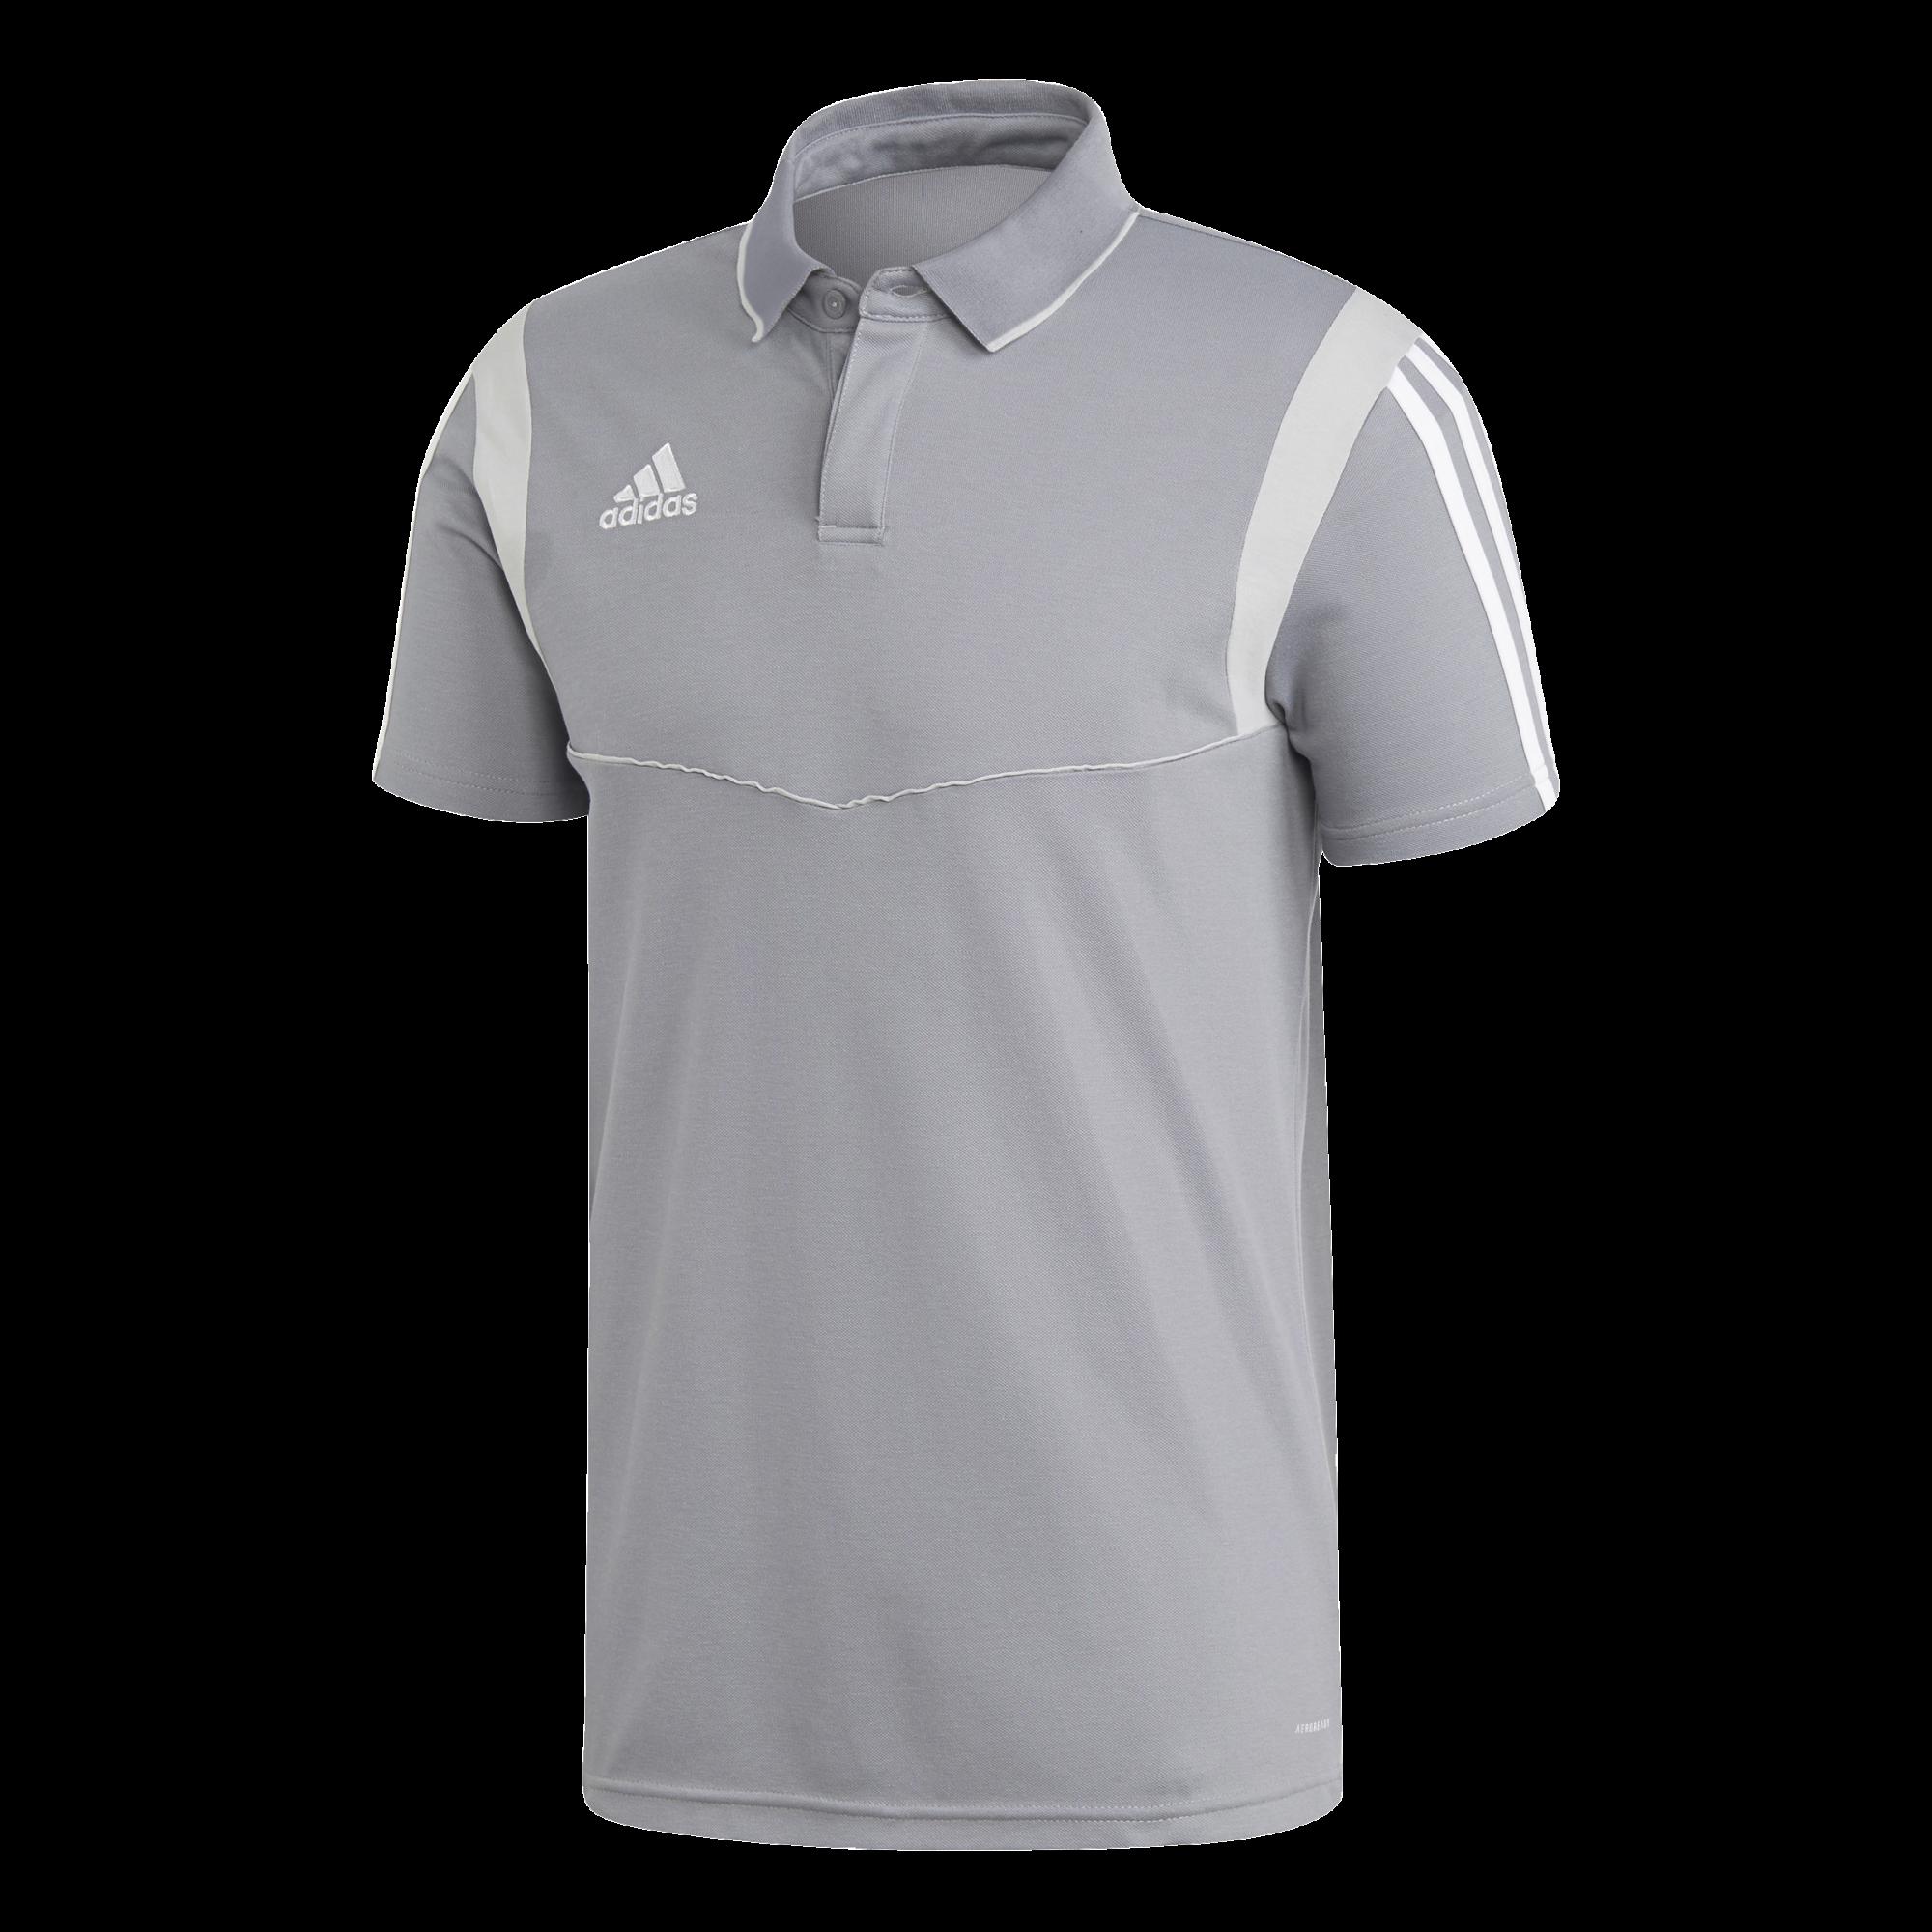 adidas Tiro 19 Cotton Poloshirt | billig kaufen